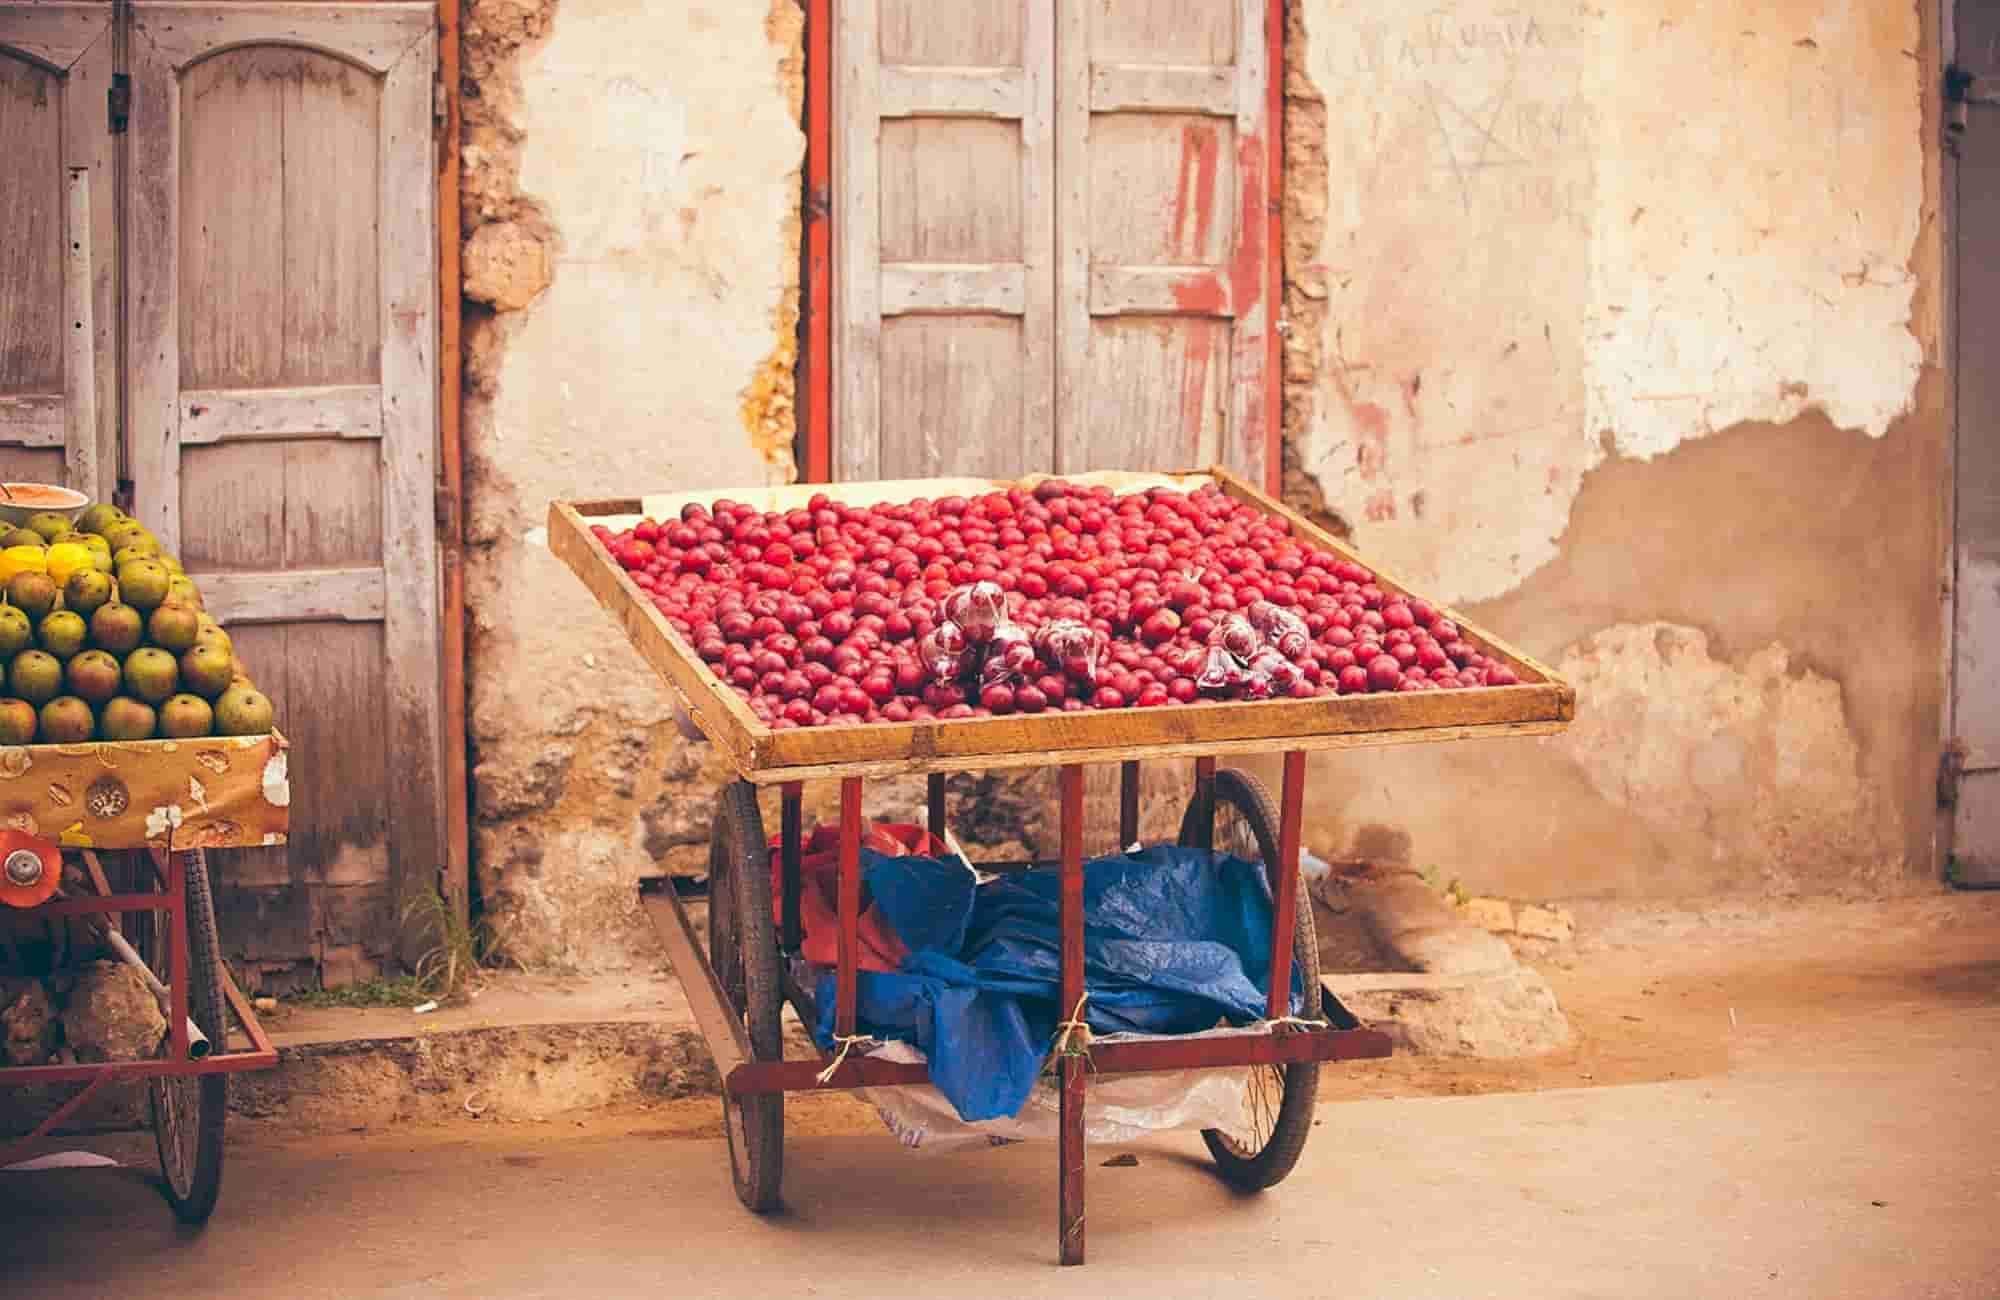 Voyage à Zanzibar - Marché local - Amplitudes